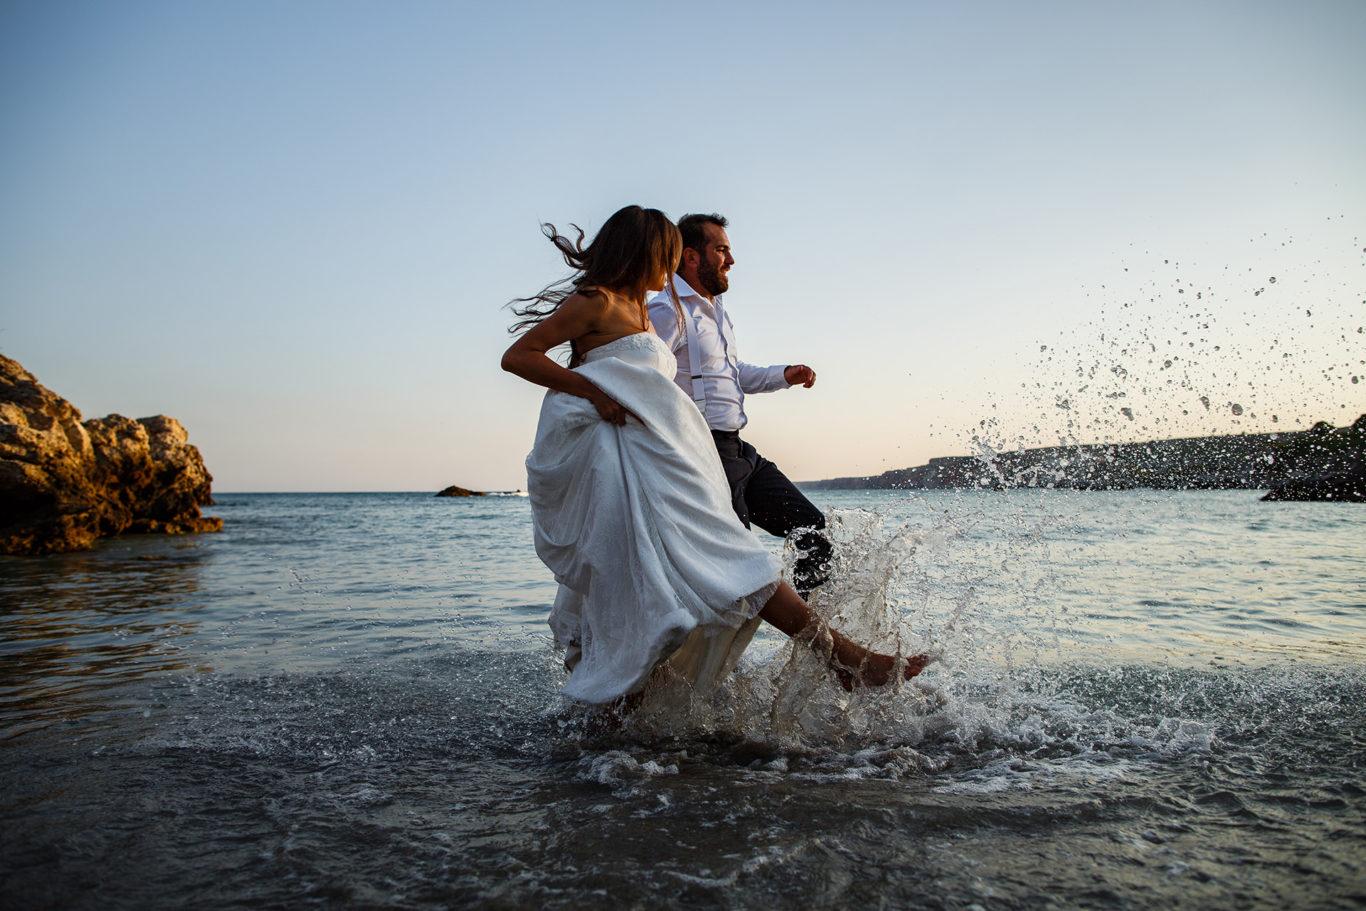 Afterwedding session Rusalka - Adriana & Dan - fotograf Ciprian Dumitrescu - fotografie nunta si familie - fotograf Bulgaria